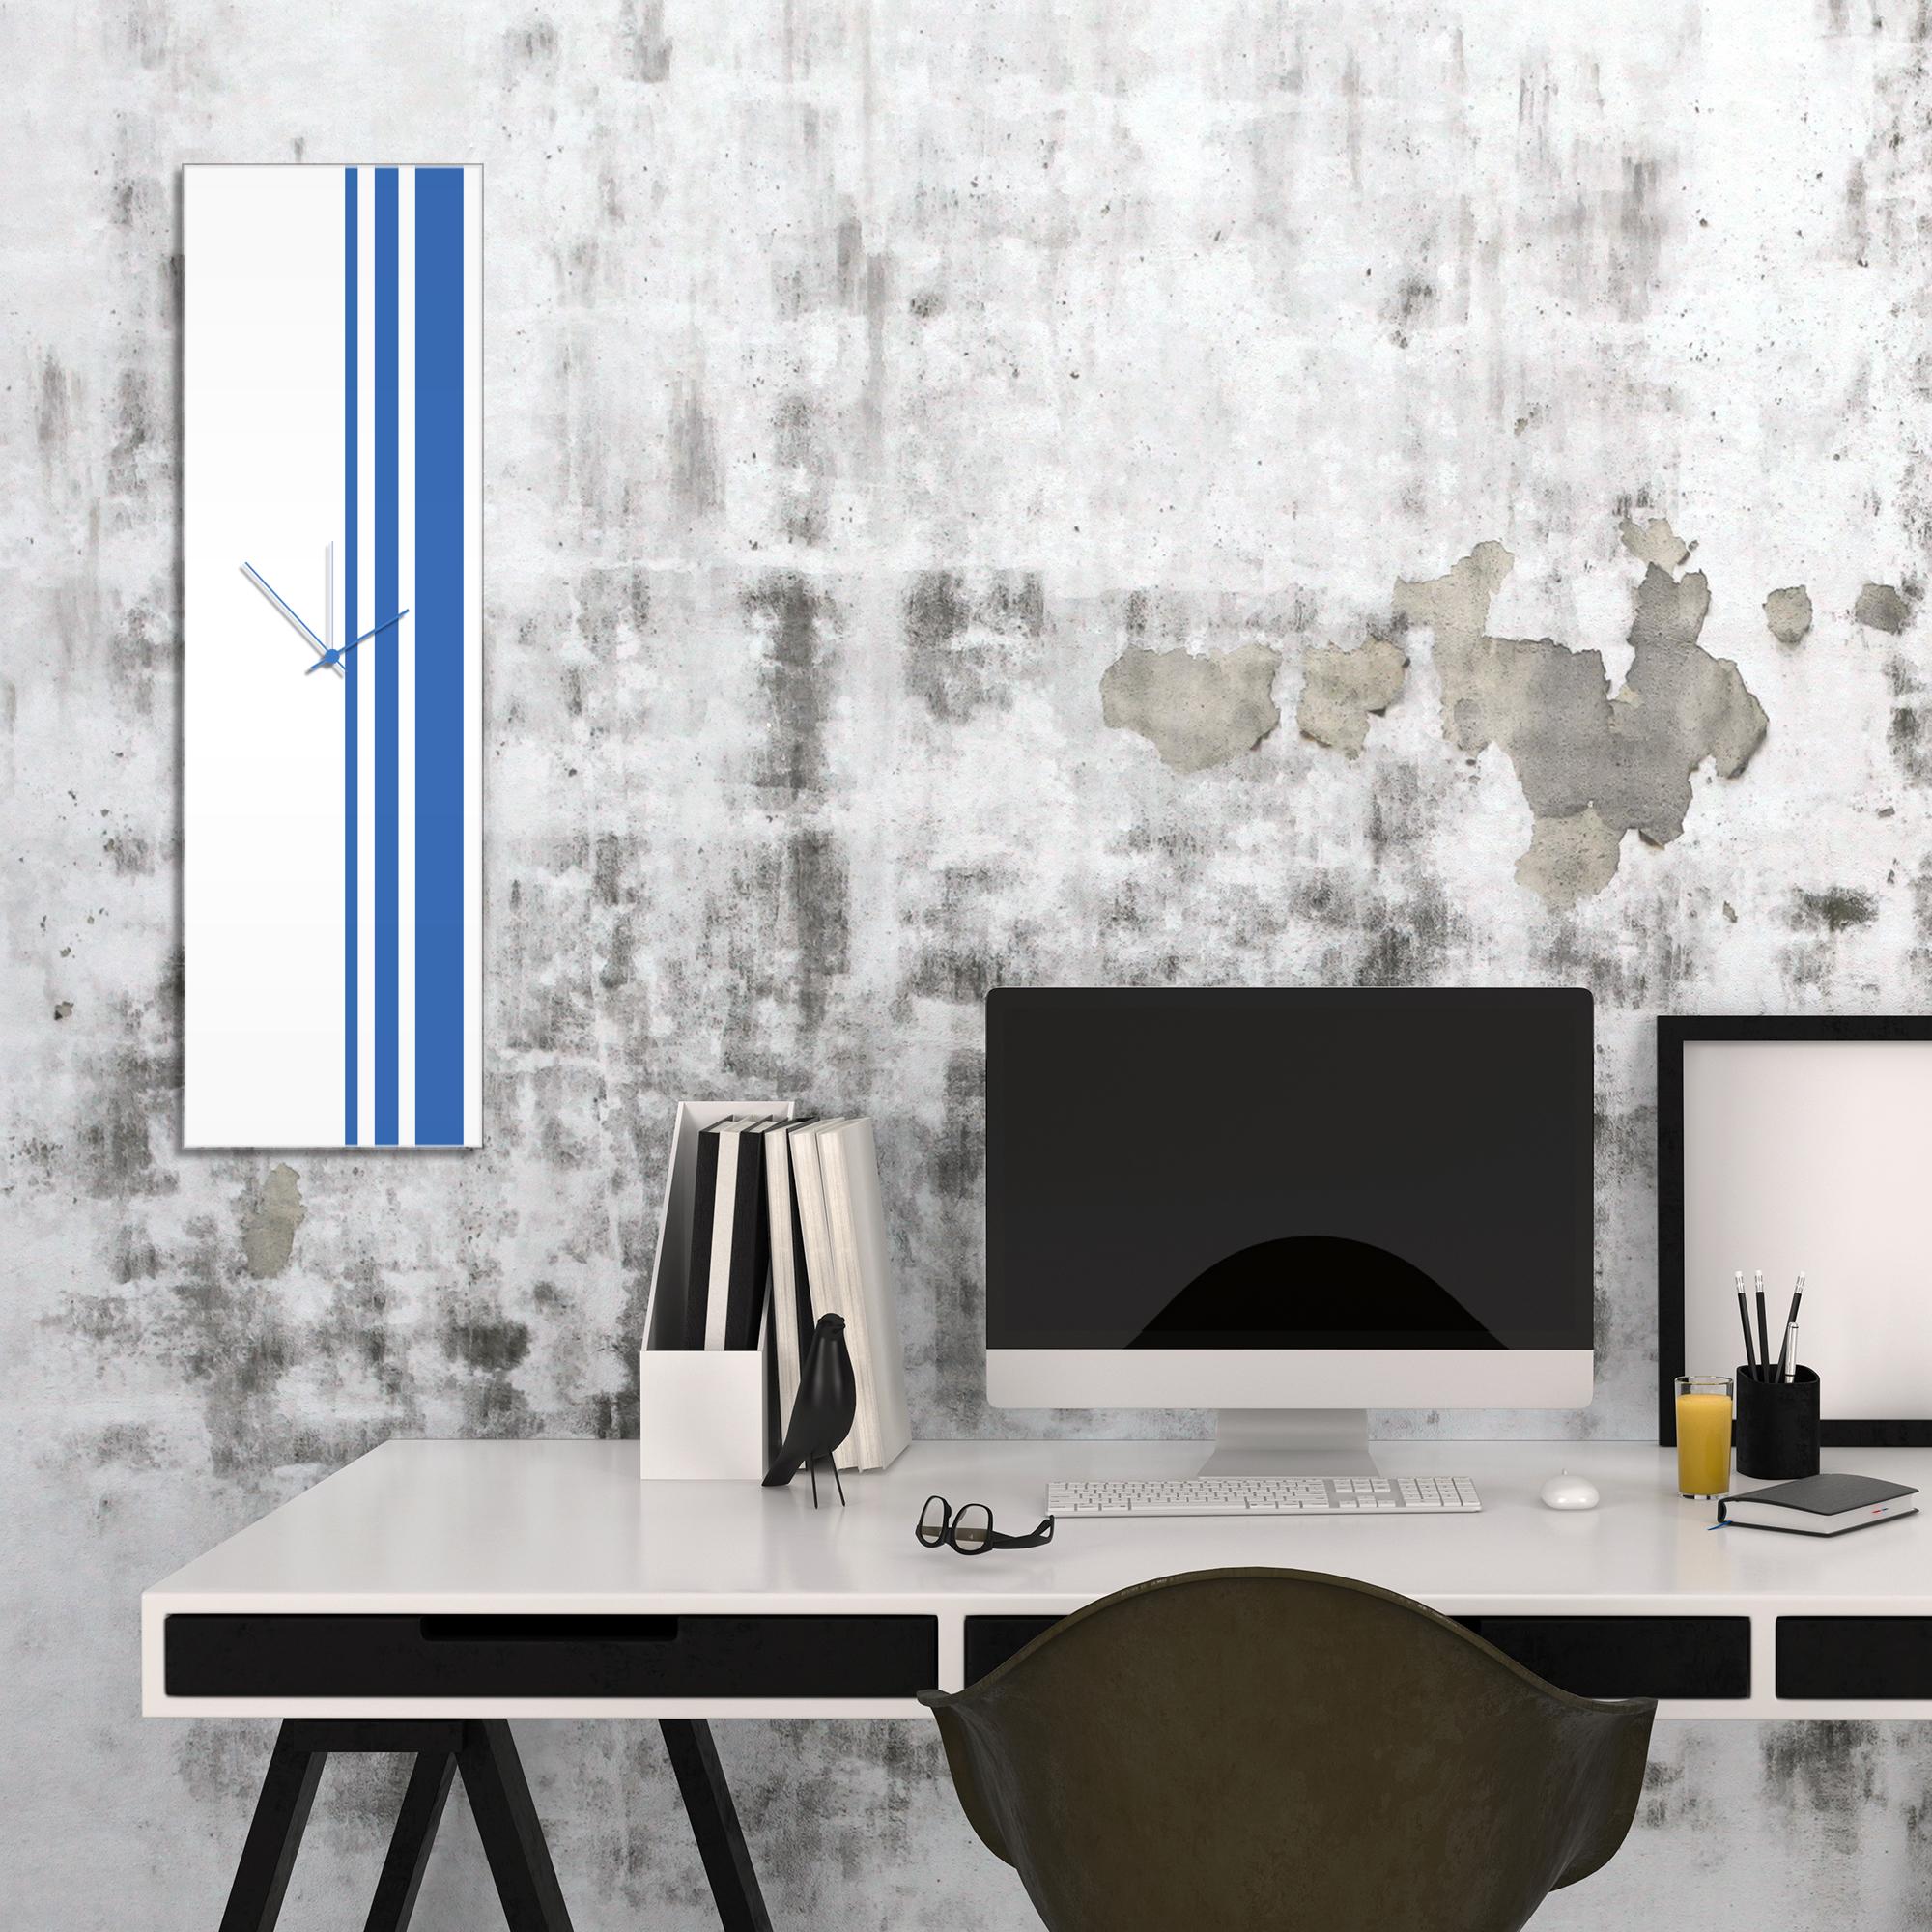 Blue Triple Stripe Clock by Adam Schwoeppe Large Modern Clock on Acrylic - Alternate View 1